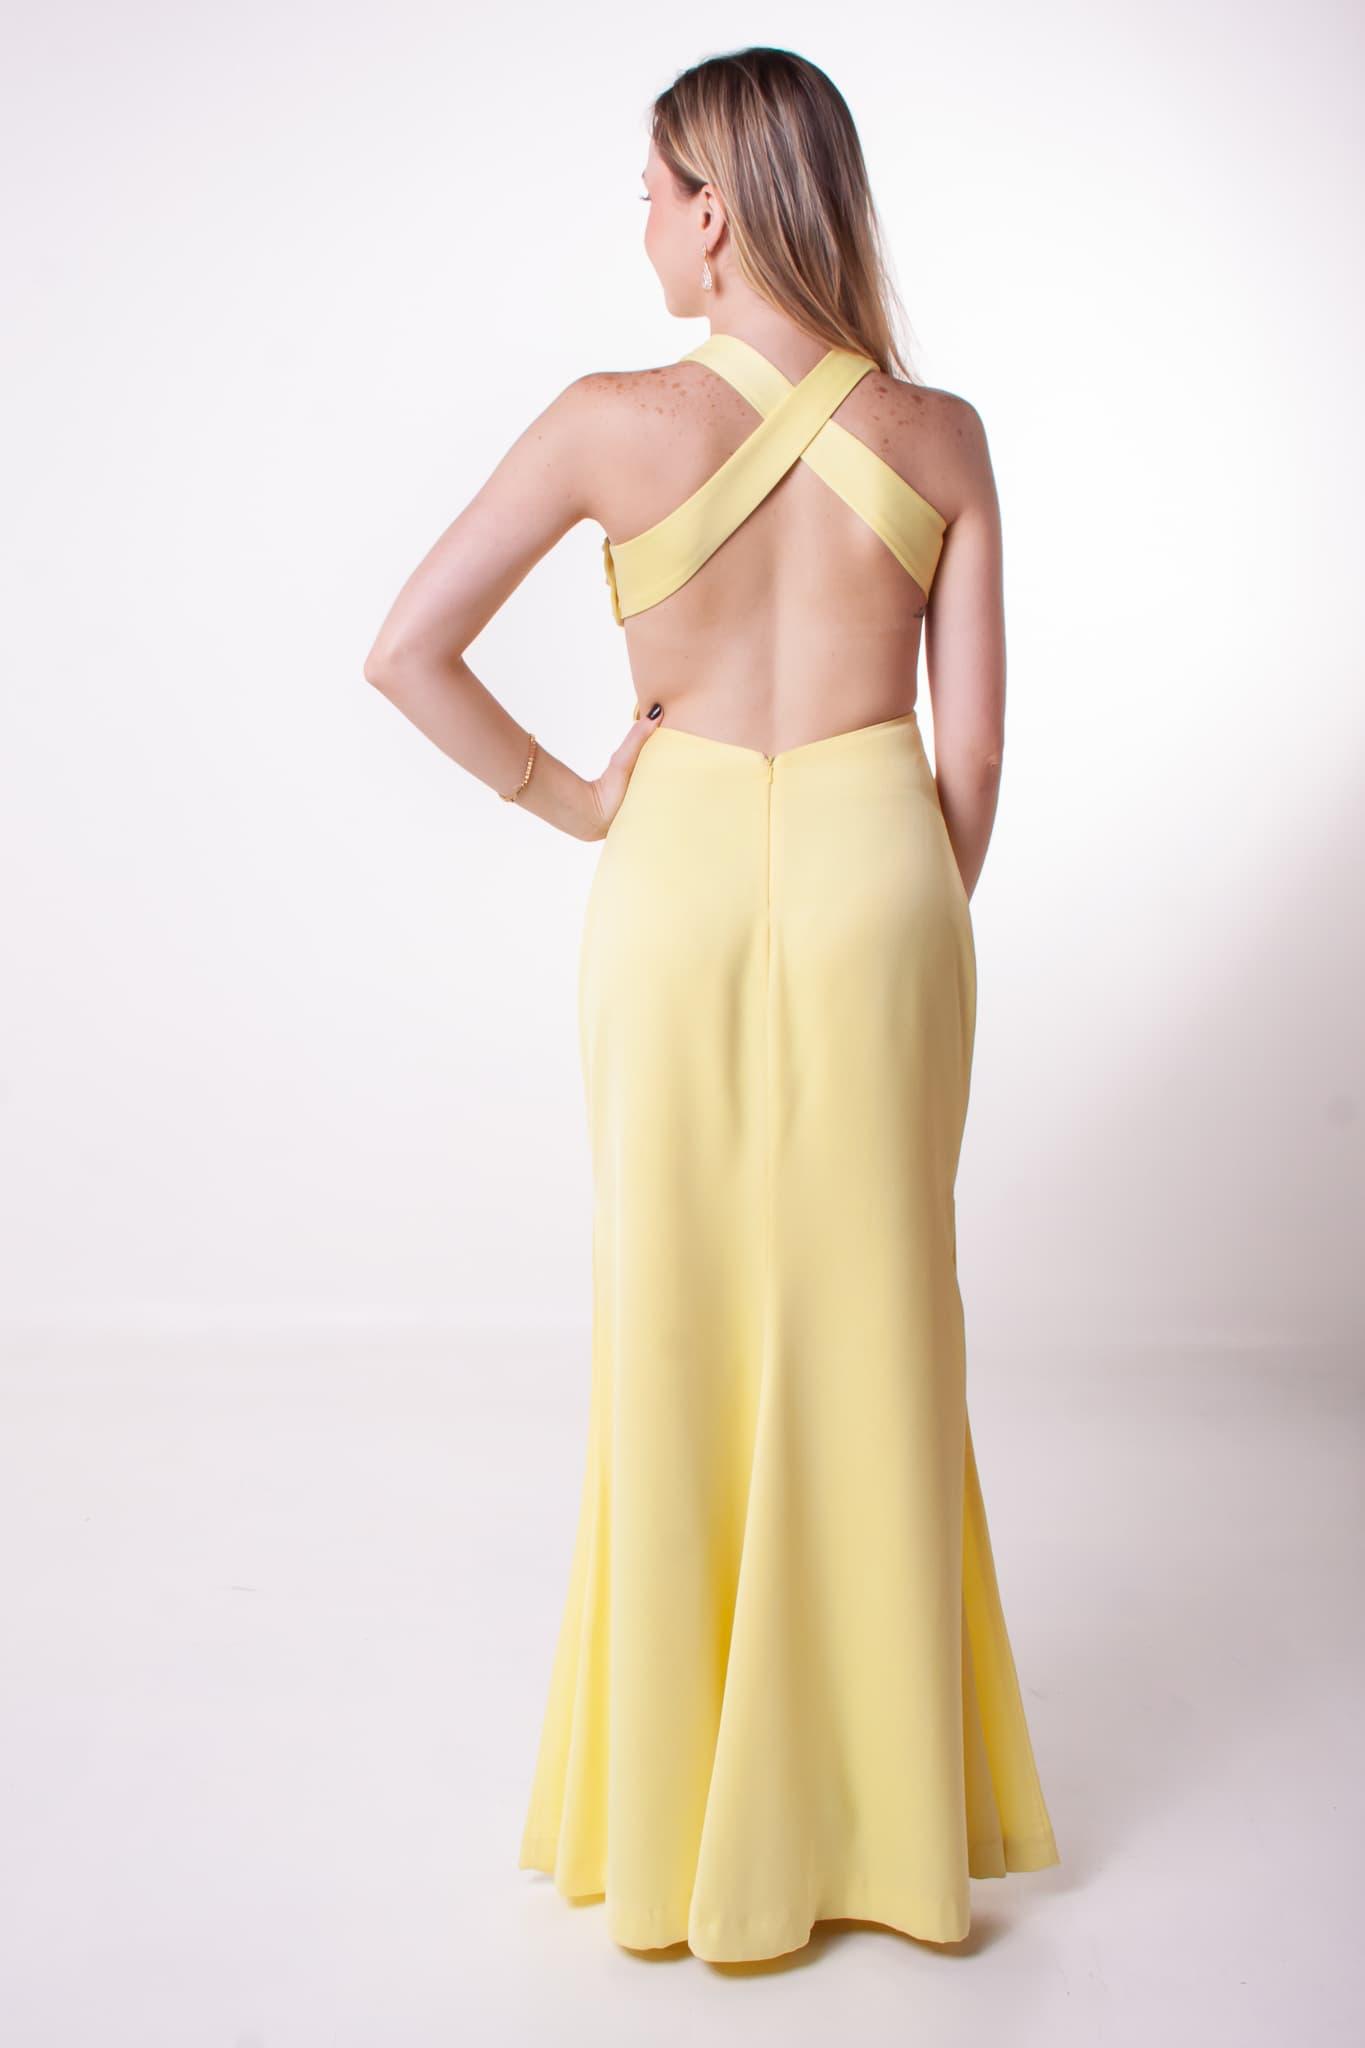 4 - Vestido amarelo cruzado nas costas